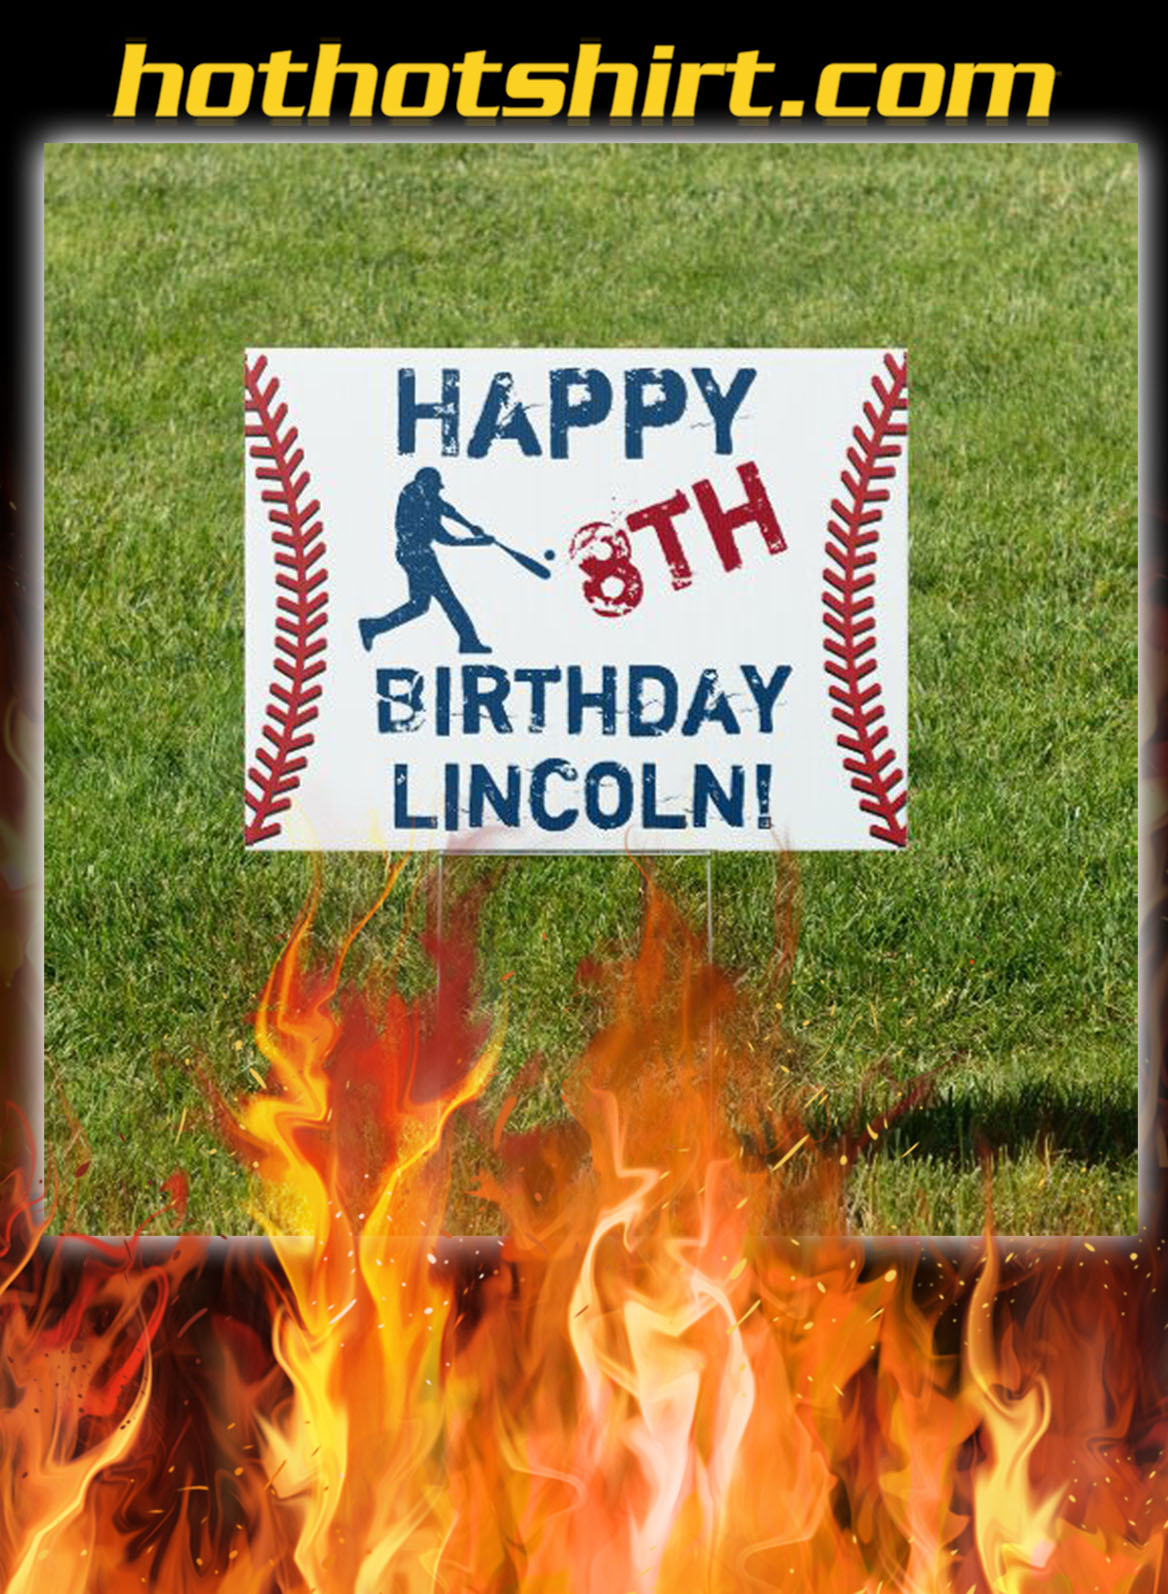 Personalized baseball happy birthday yard sign- pic 1